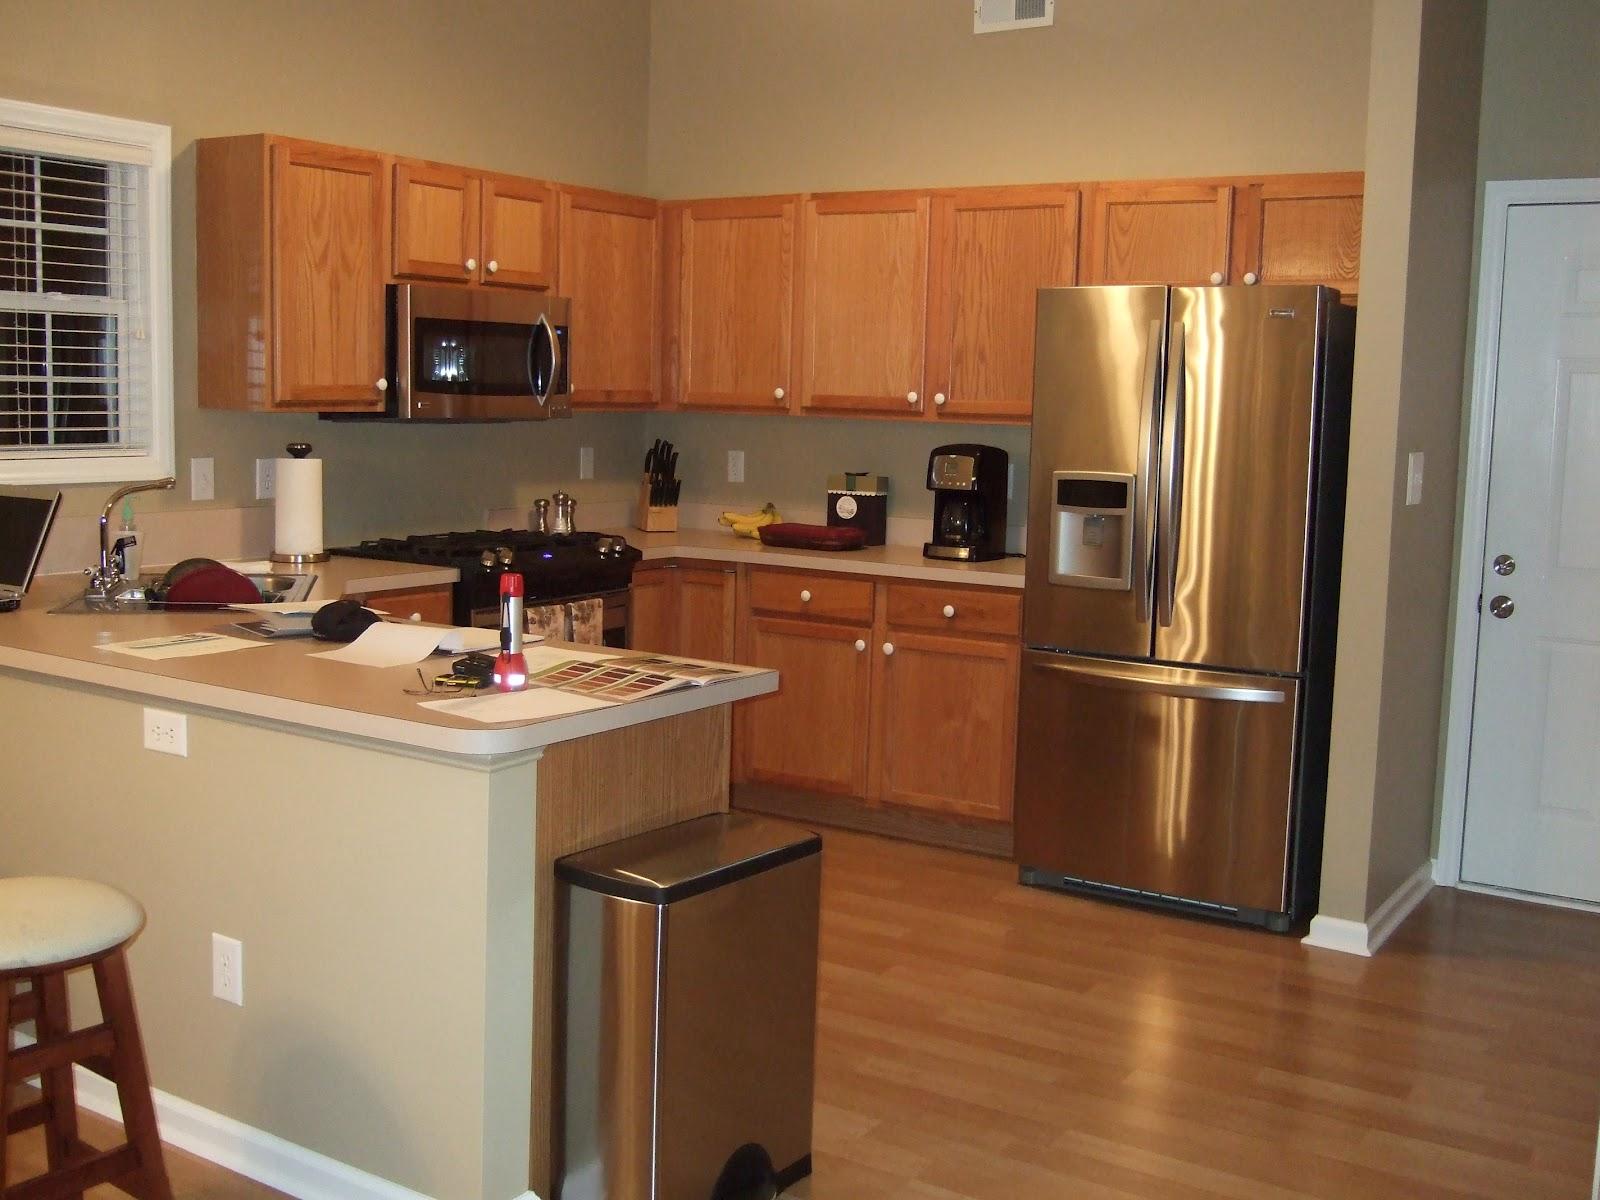 Updated Kitchens Kitchen Trash Bags W D Osborne Design Construction 919 493 2936 Before After